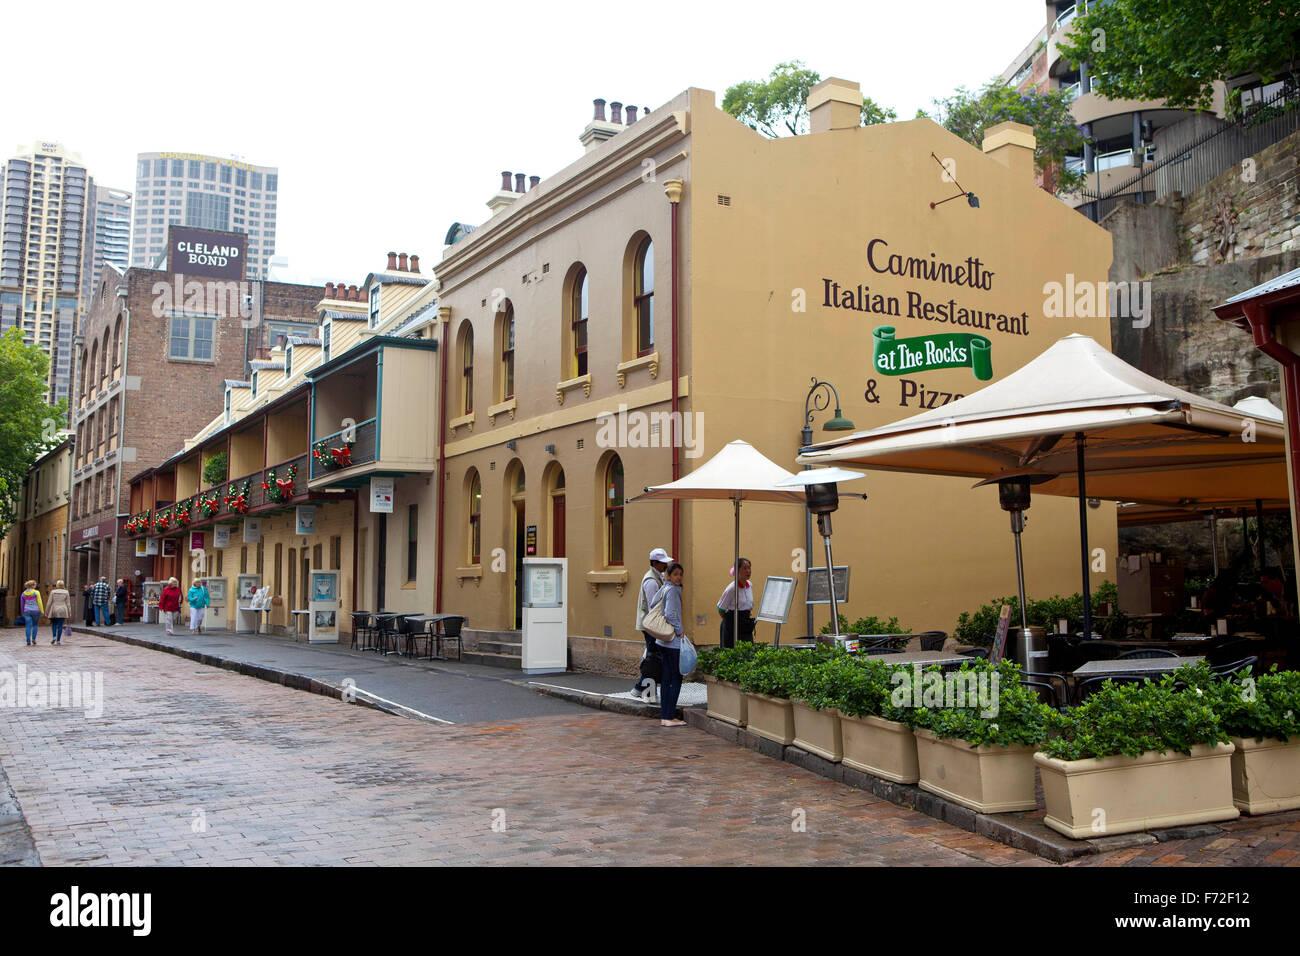 Caminetto italian restaurant at the rocks sydney for Australian cuisine restaurants sydney